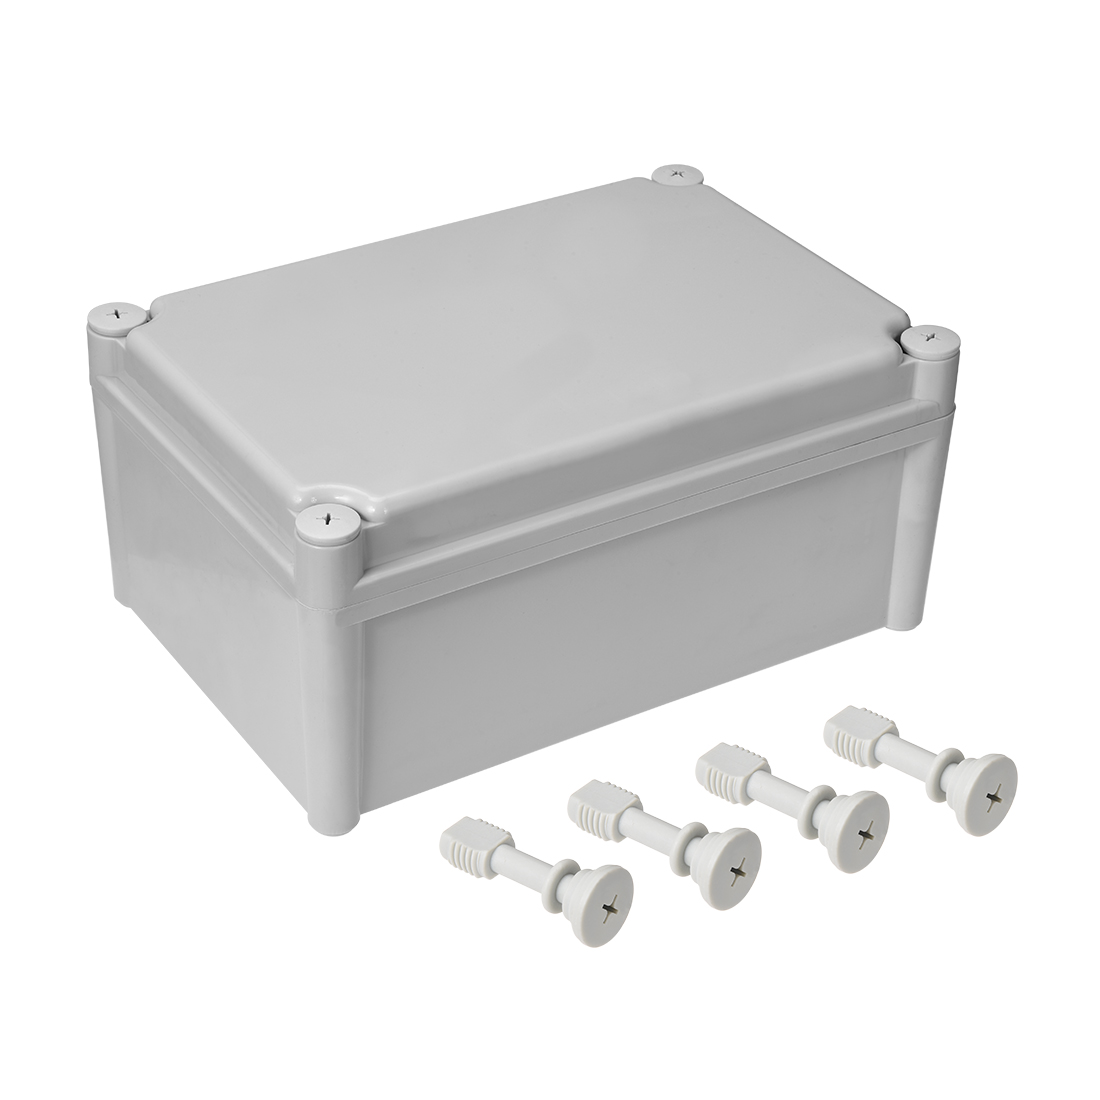 280mmx190mmx130mm Dustproof IP65 Junction Box DIY Terminal Connecting Box Gray